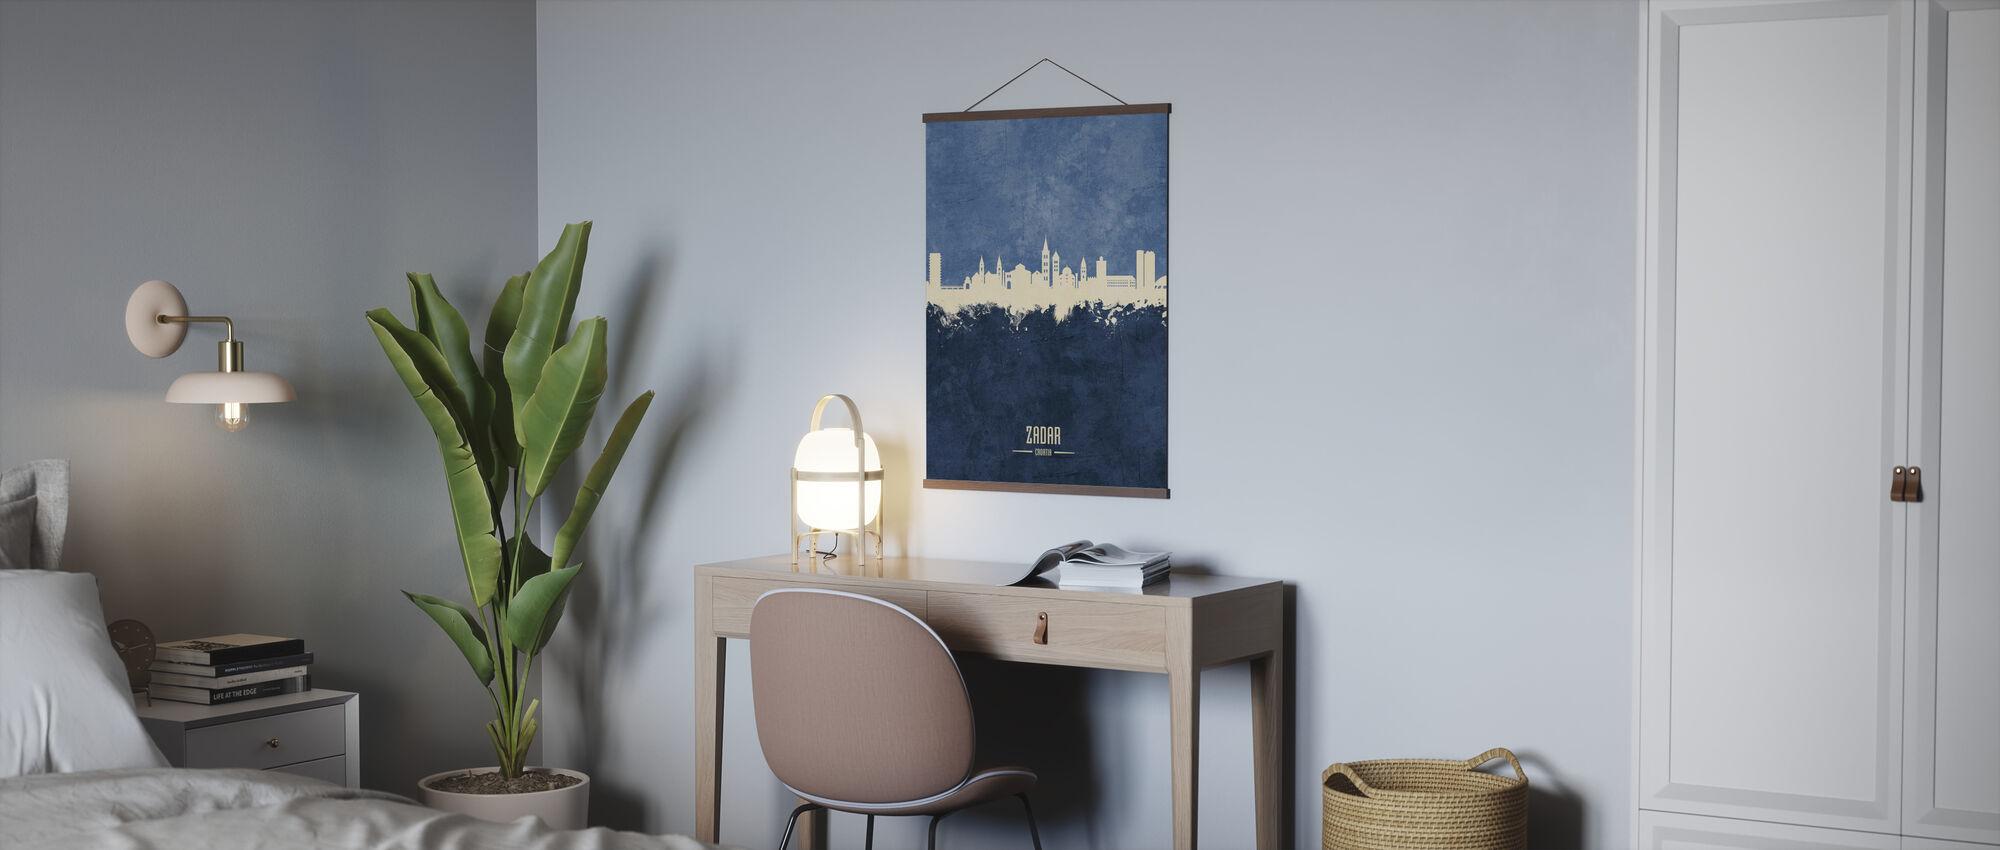 Zadar Croatia Skyline - Poster - Office